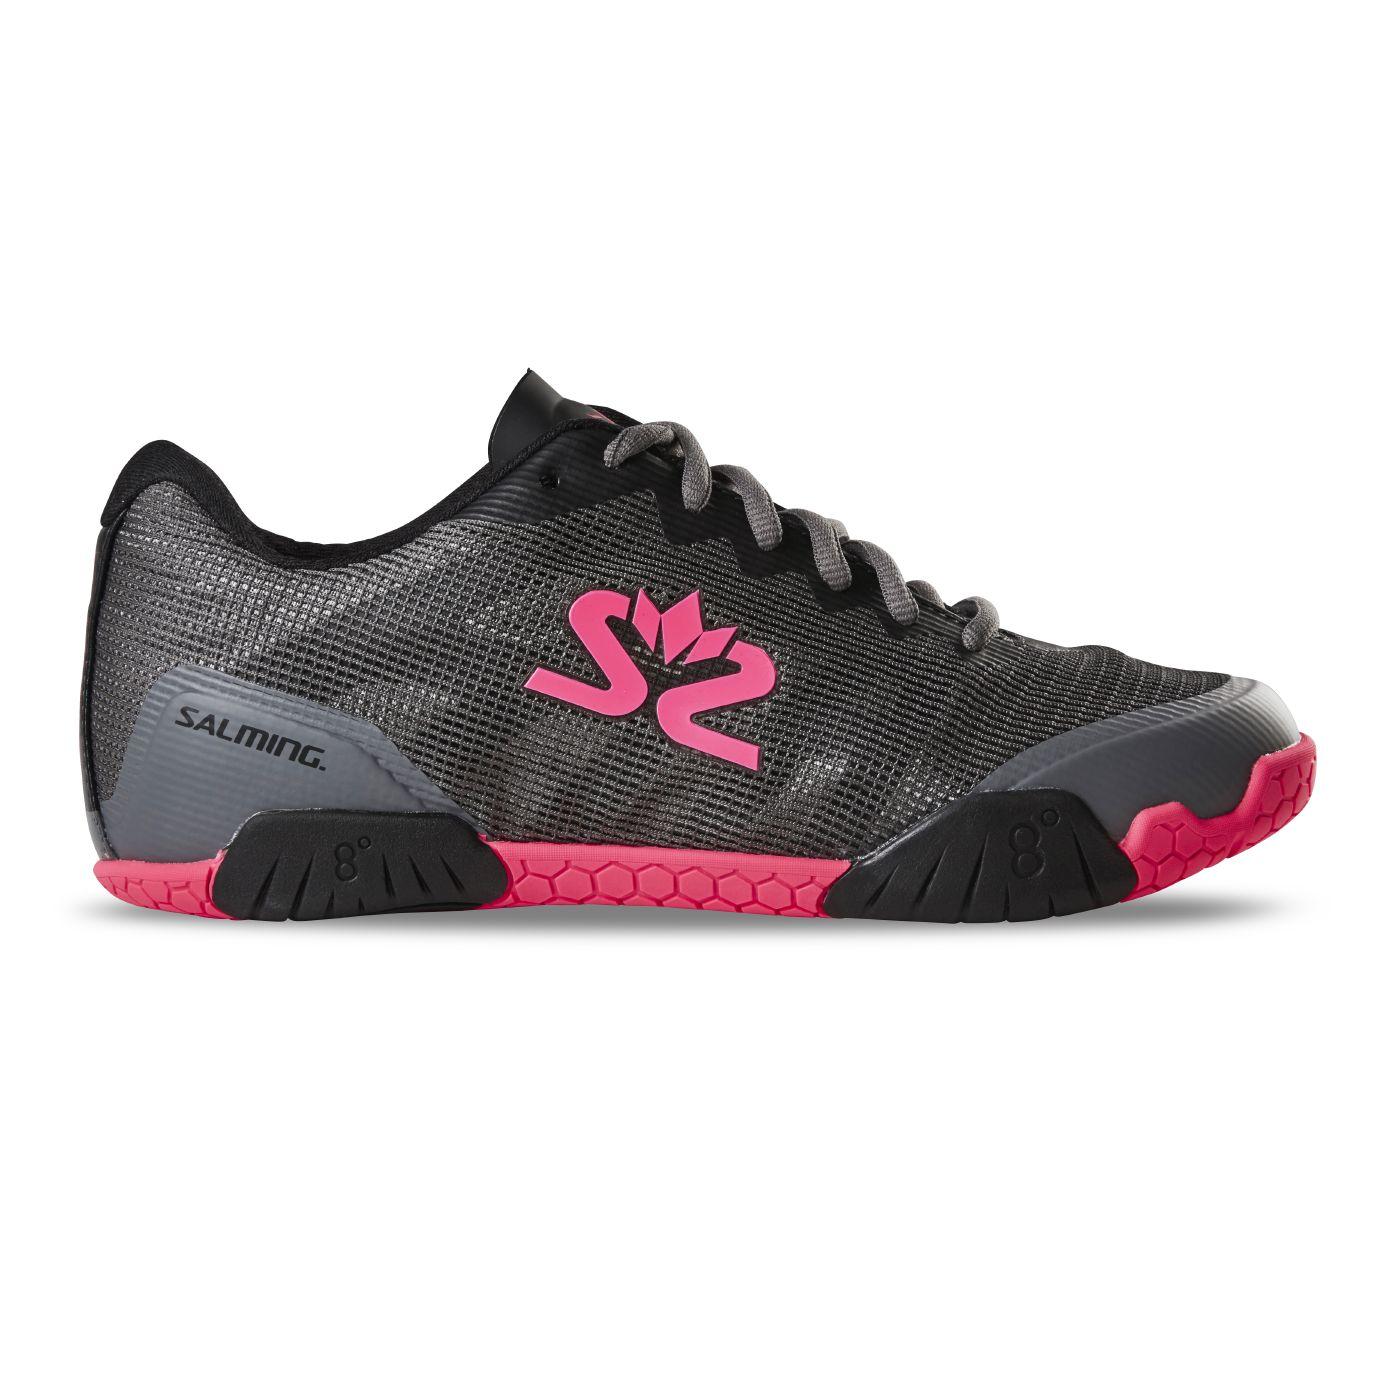 Salming Hawk Shoe Women GunMetal/Pink 8 UK - 42 EUR - 27 cm